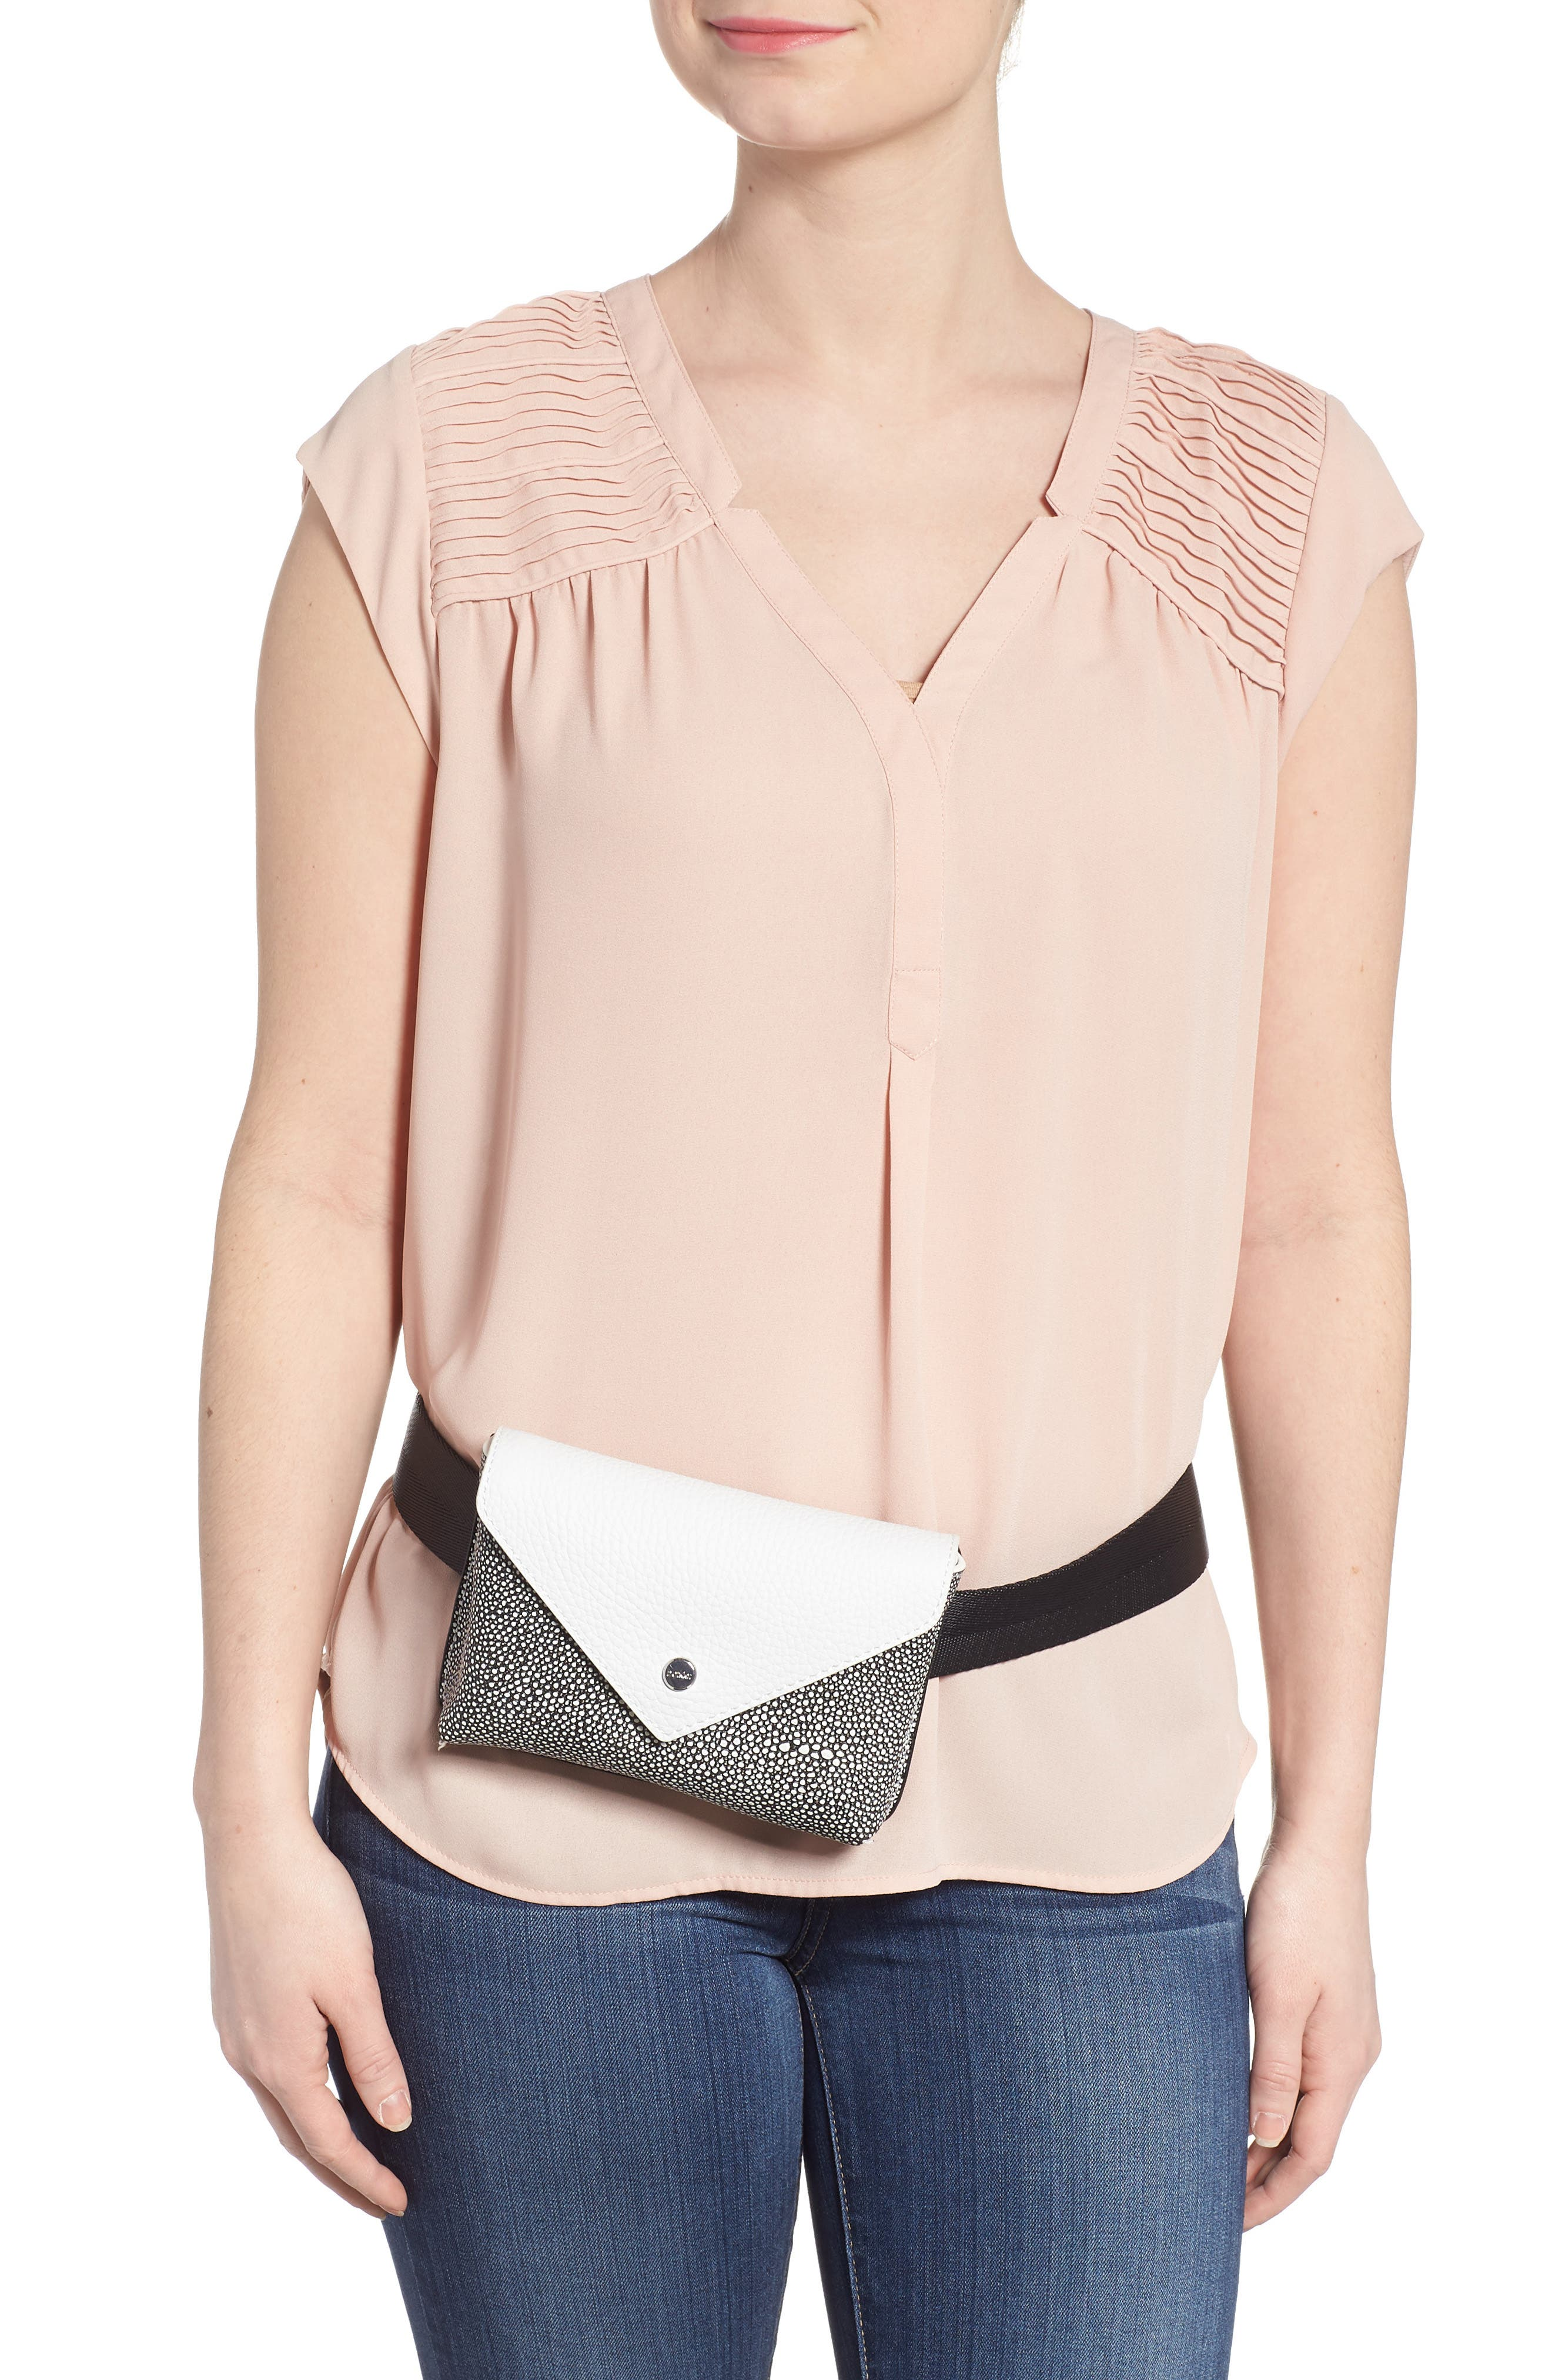 Vivi Calfskin Leather Convertible Belt Bag,                             Alternate thumbnail 4, color,                             Chalk Stingray